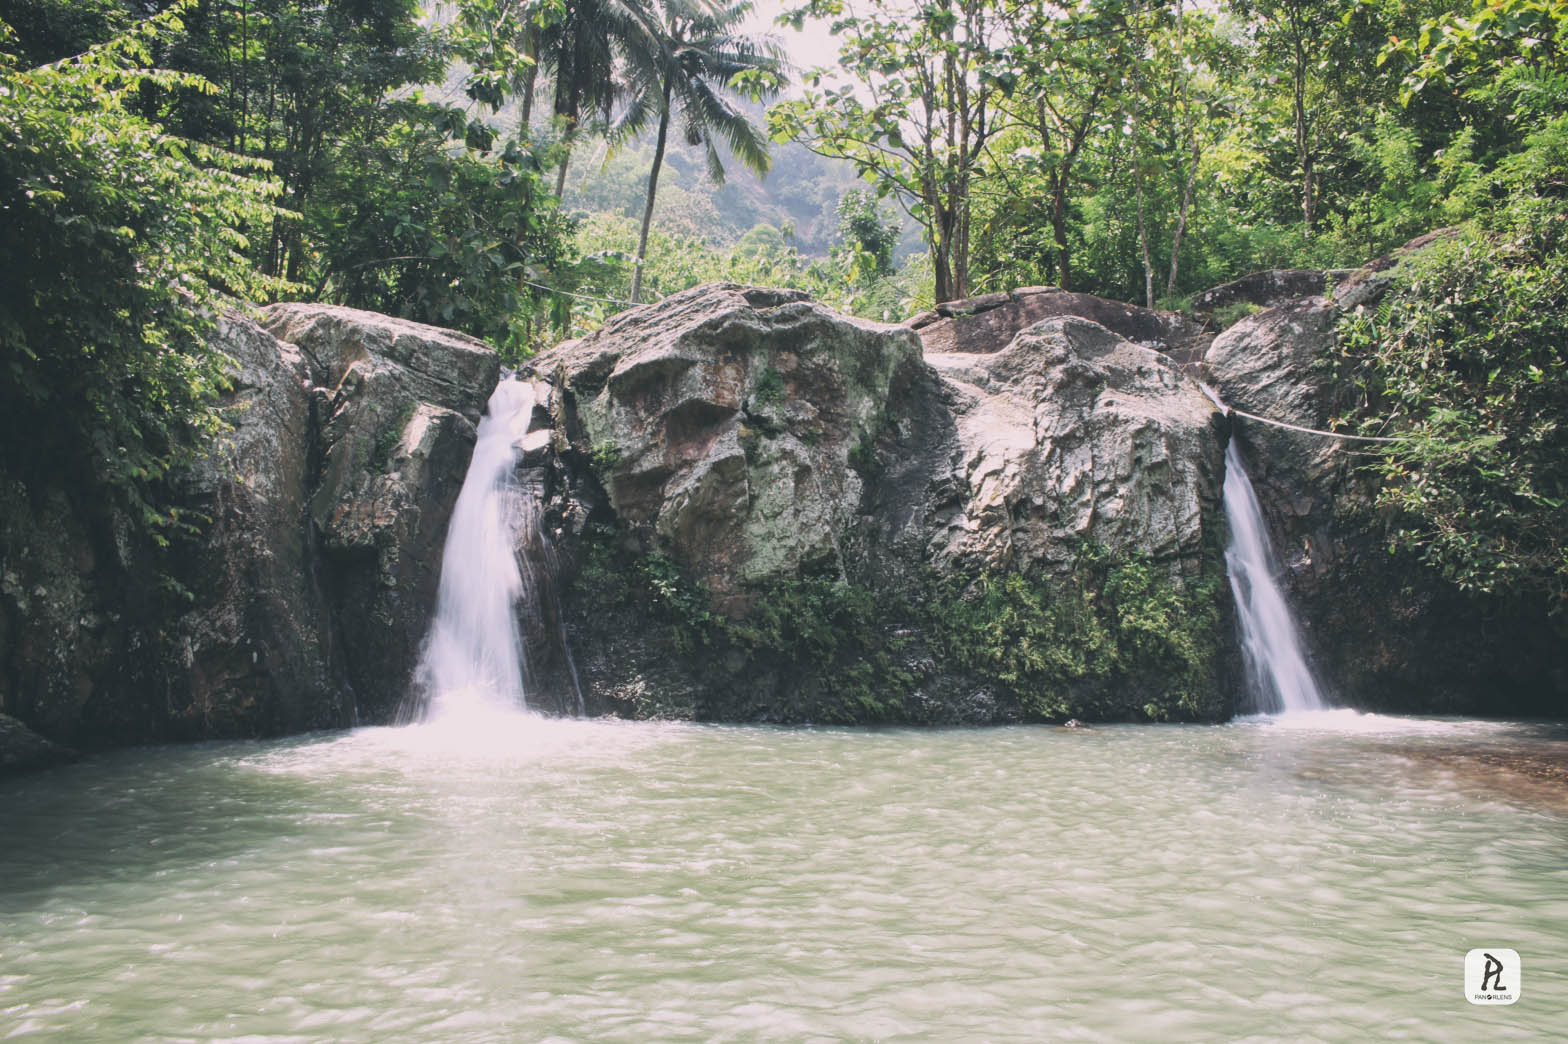 Curug Indah Tegalrejo Pesona Tersembunyi Gunung Kidul Panorlens Bayat Kab